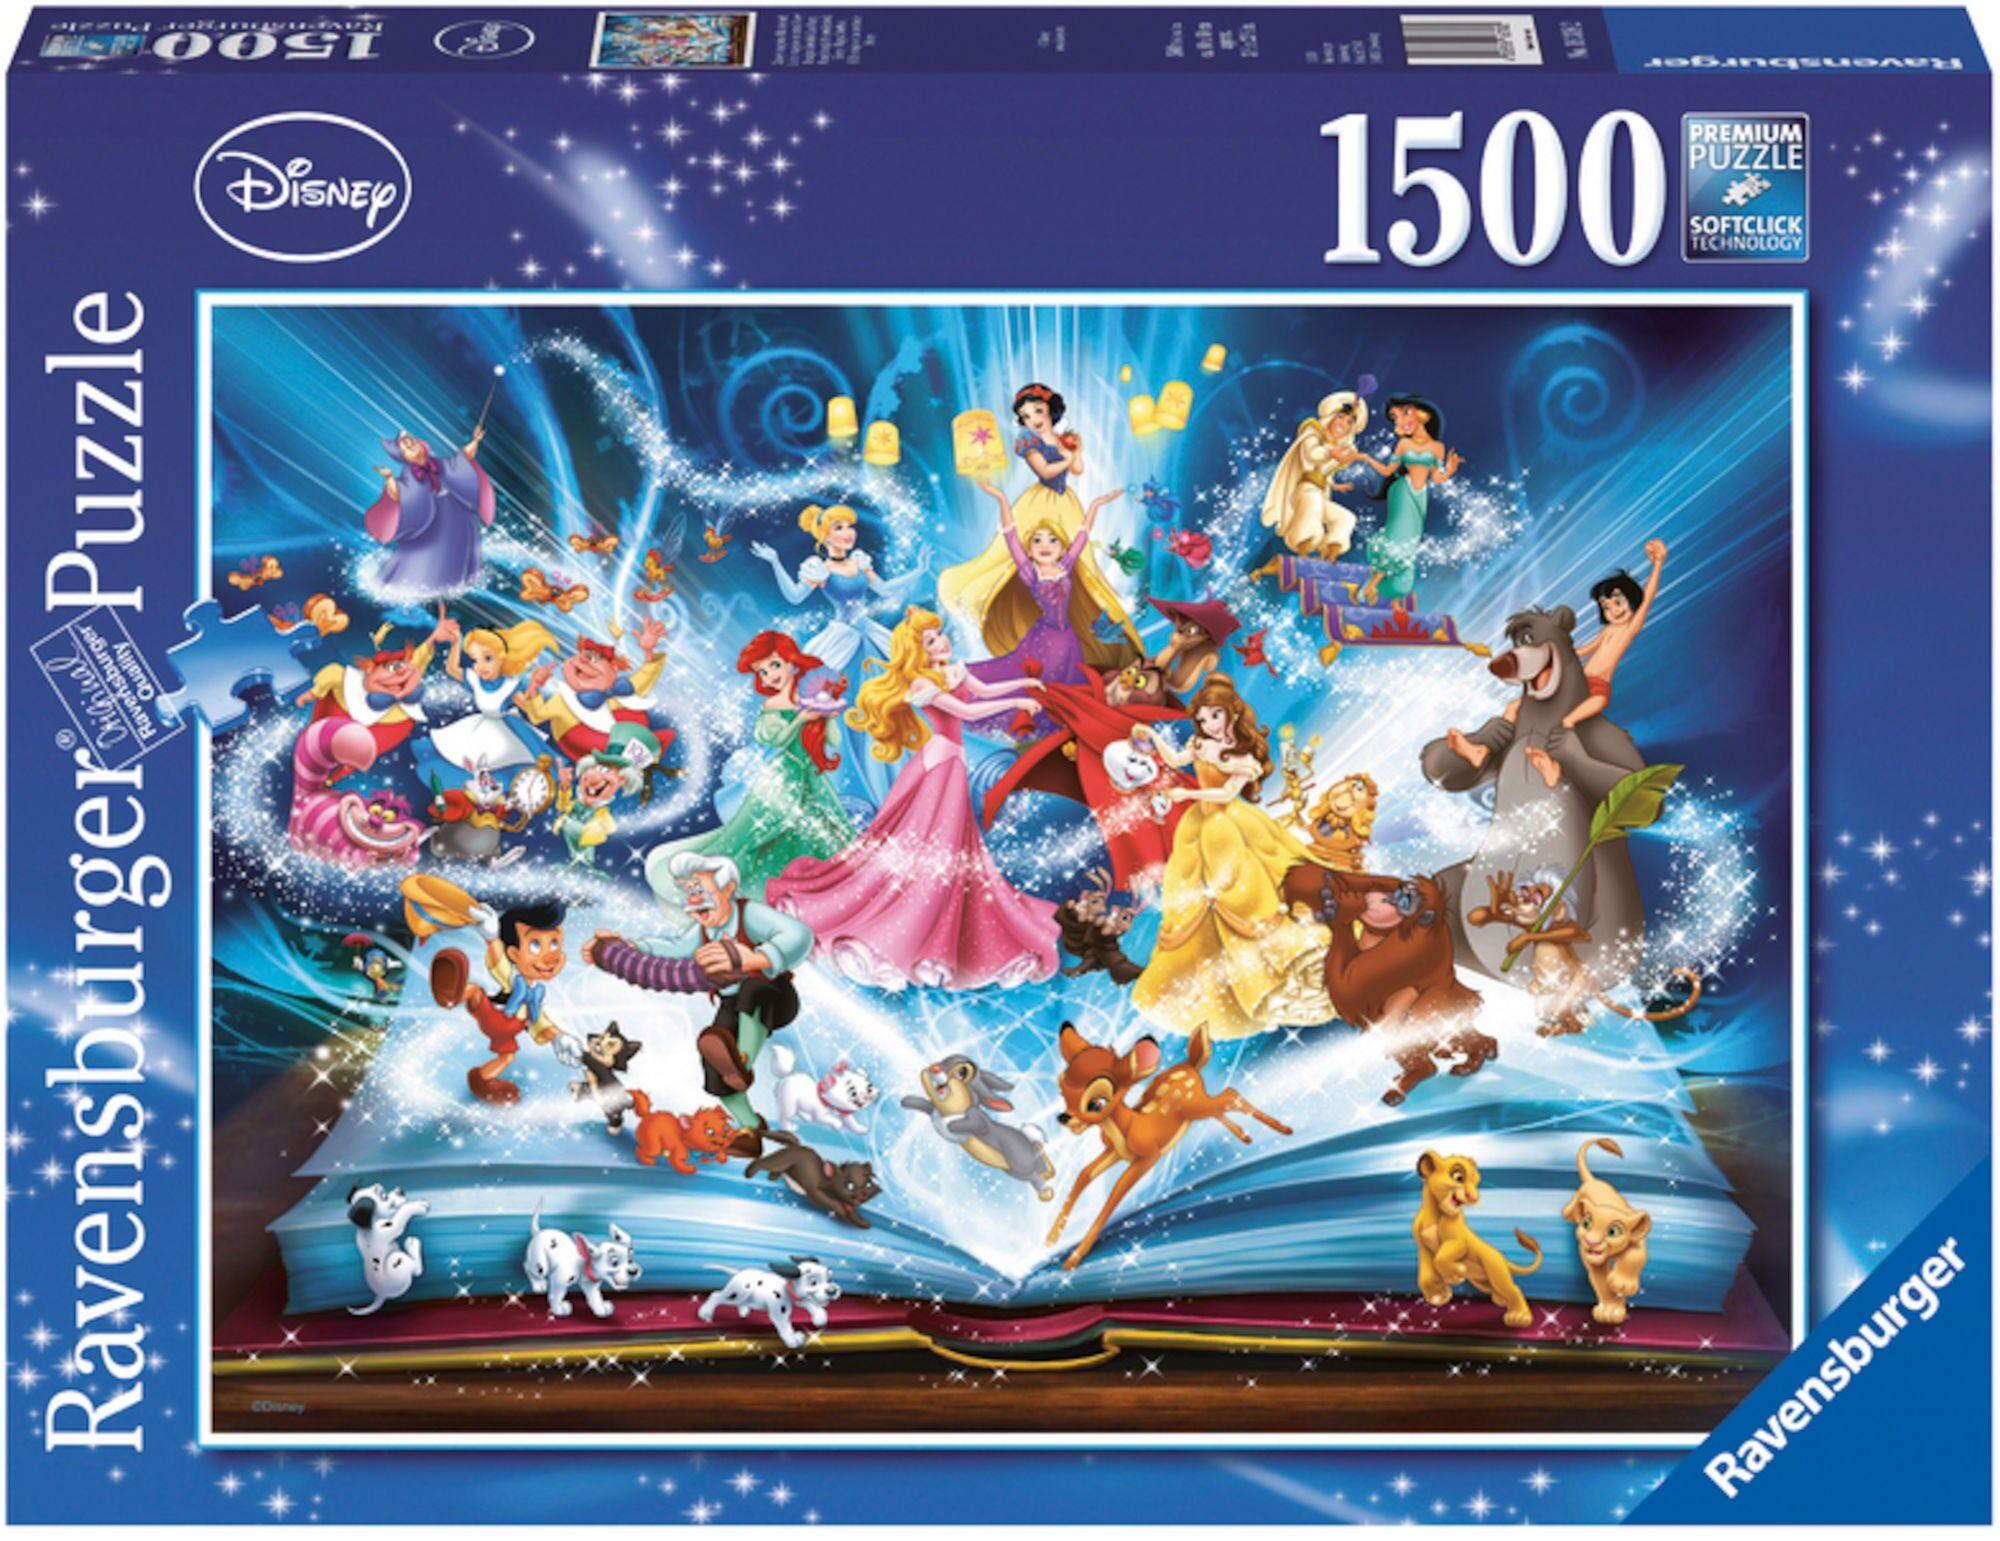 Disney Ravensburger Disney Puslespill 1500 Biter